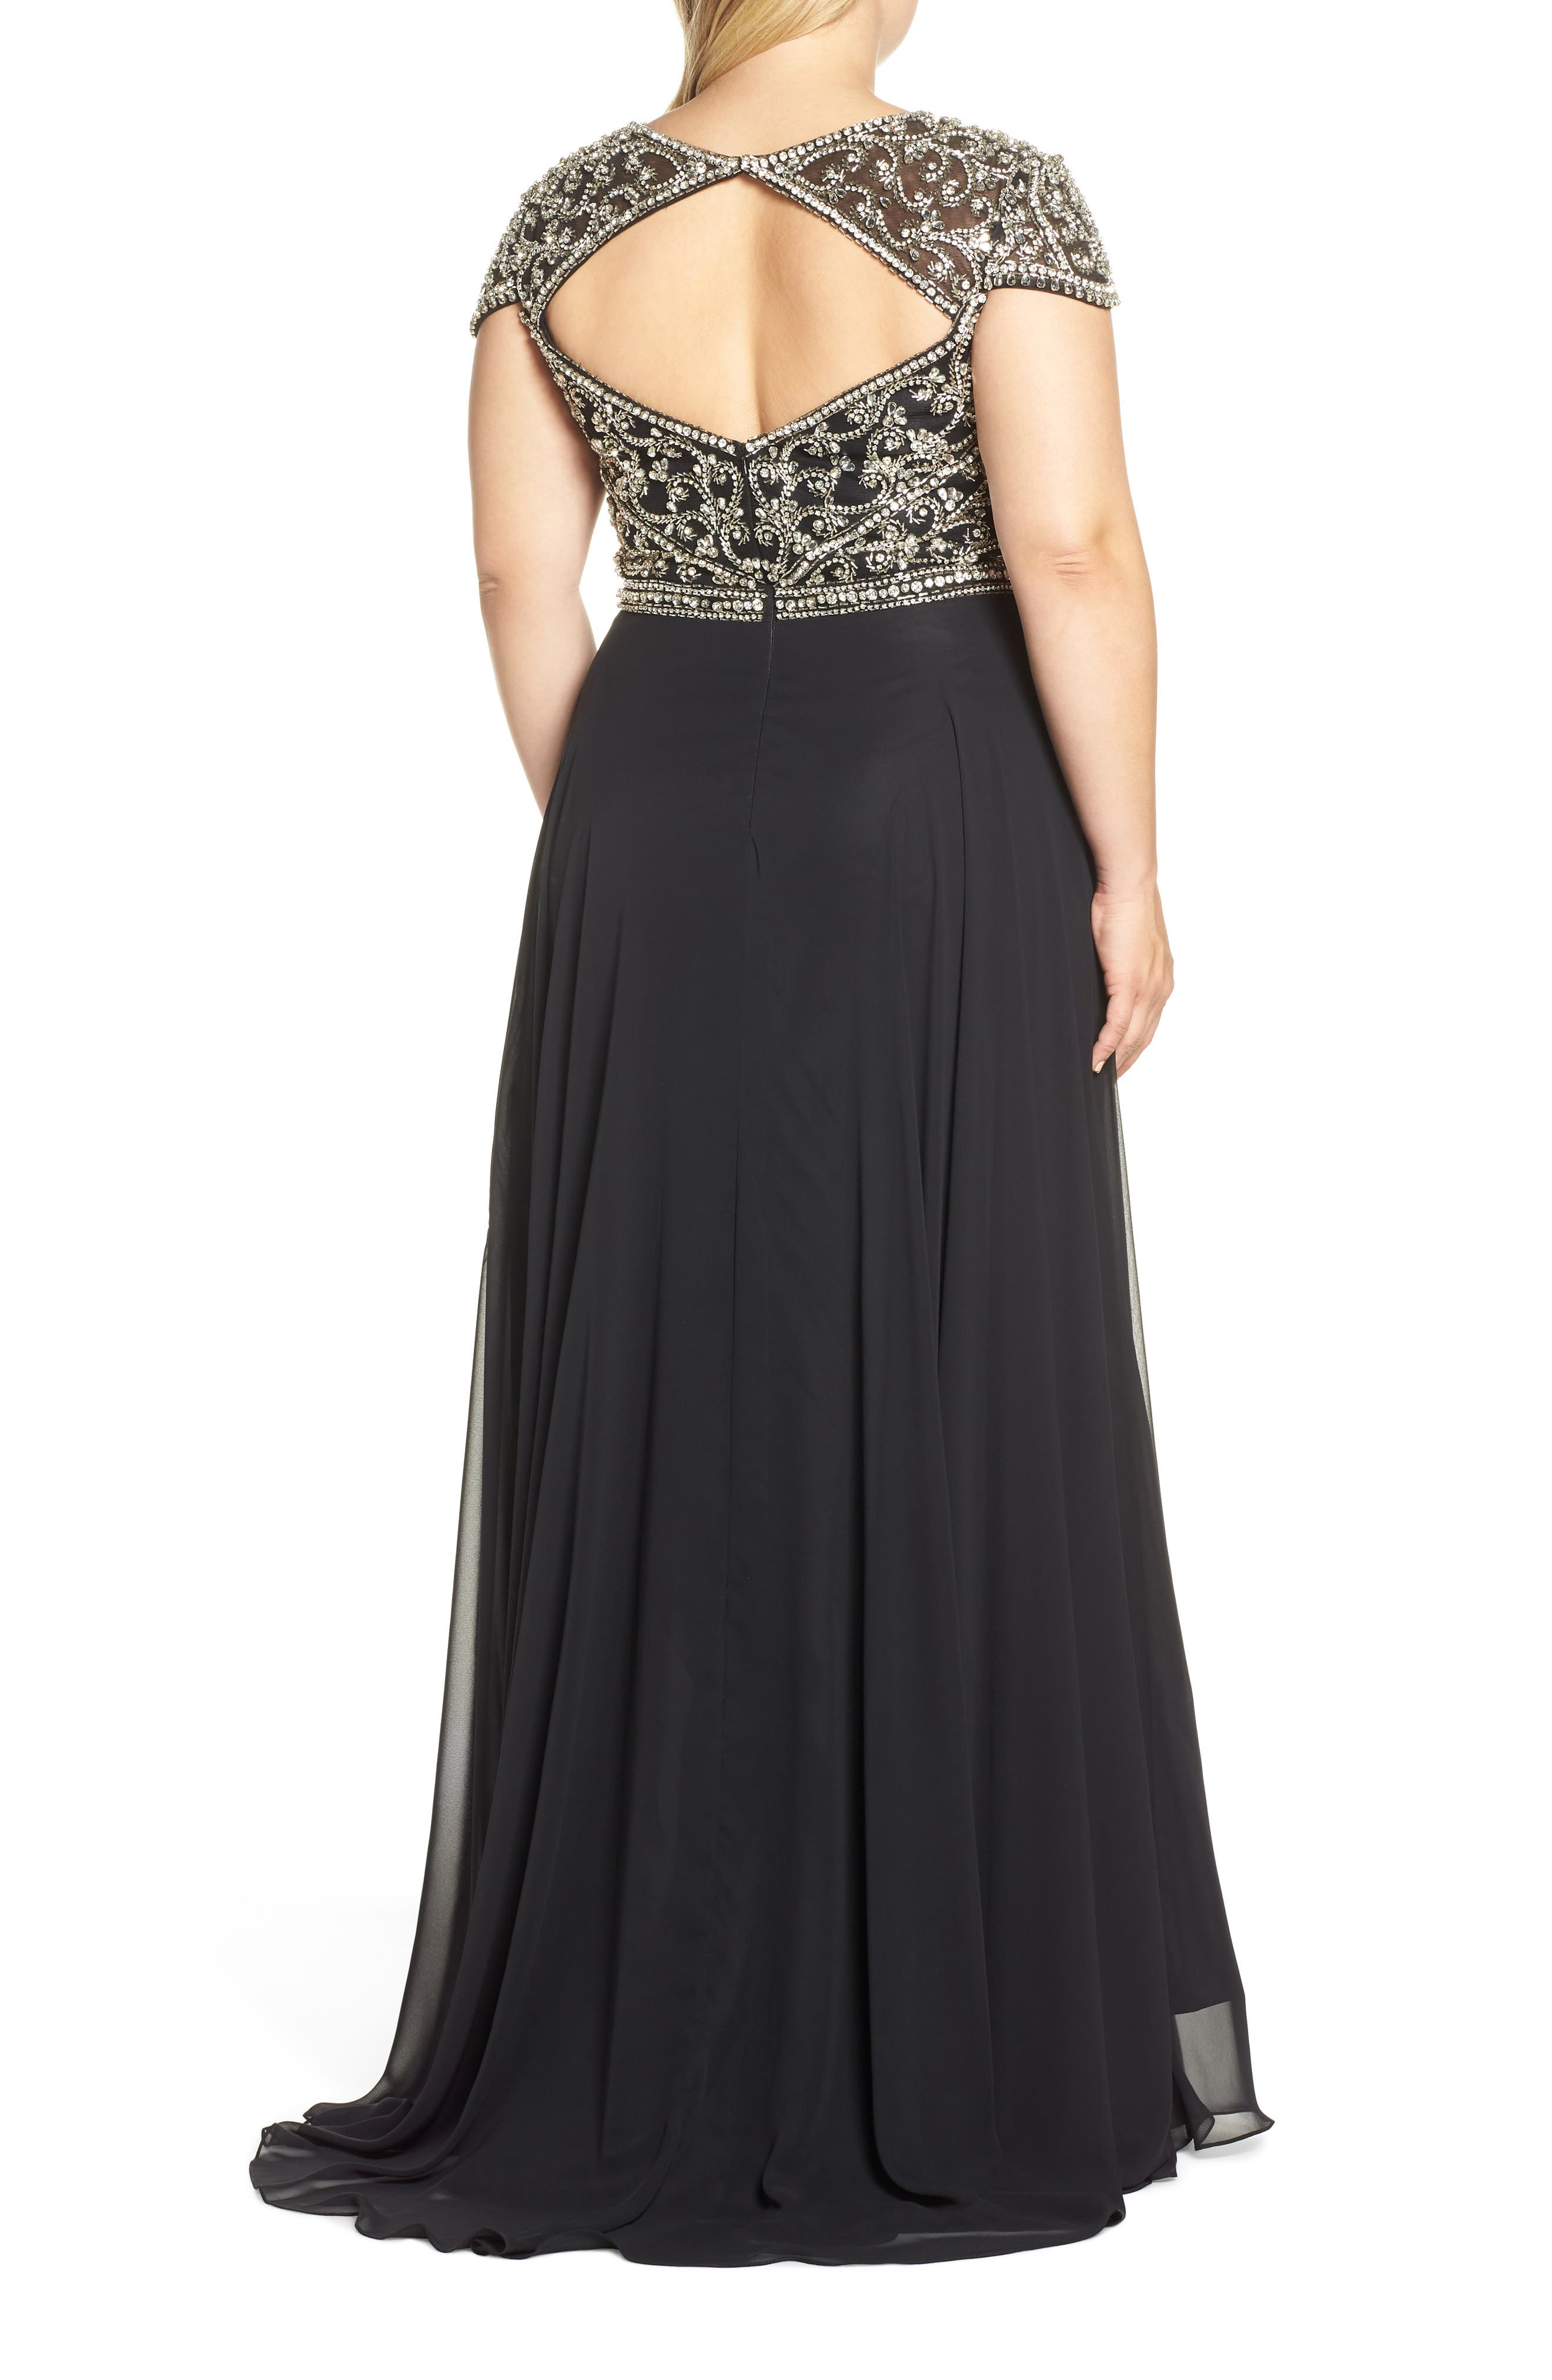 MAC DUGGAL, Embellished Bodice Evening Dress, Alternate thumbnail 2, color, BLACK